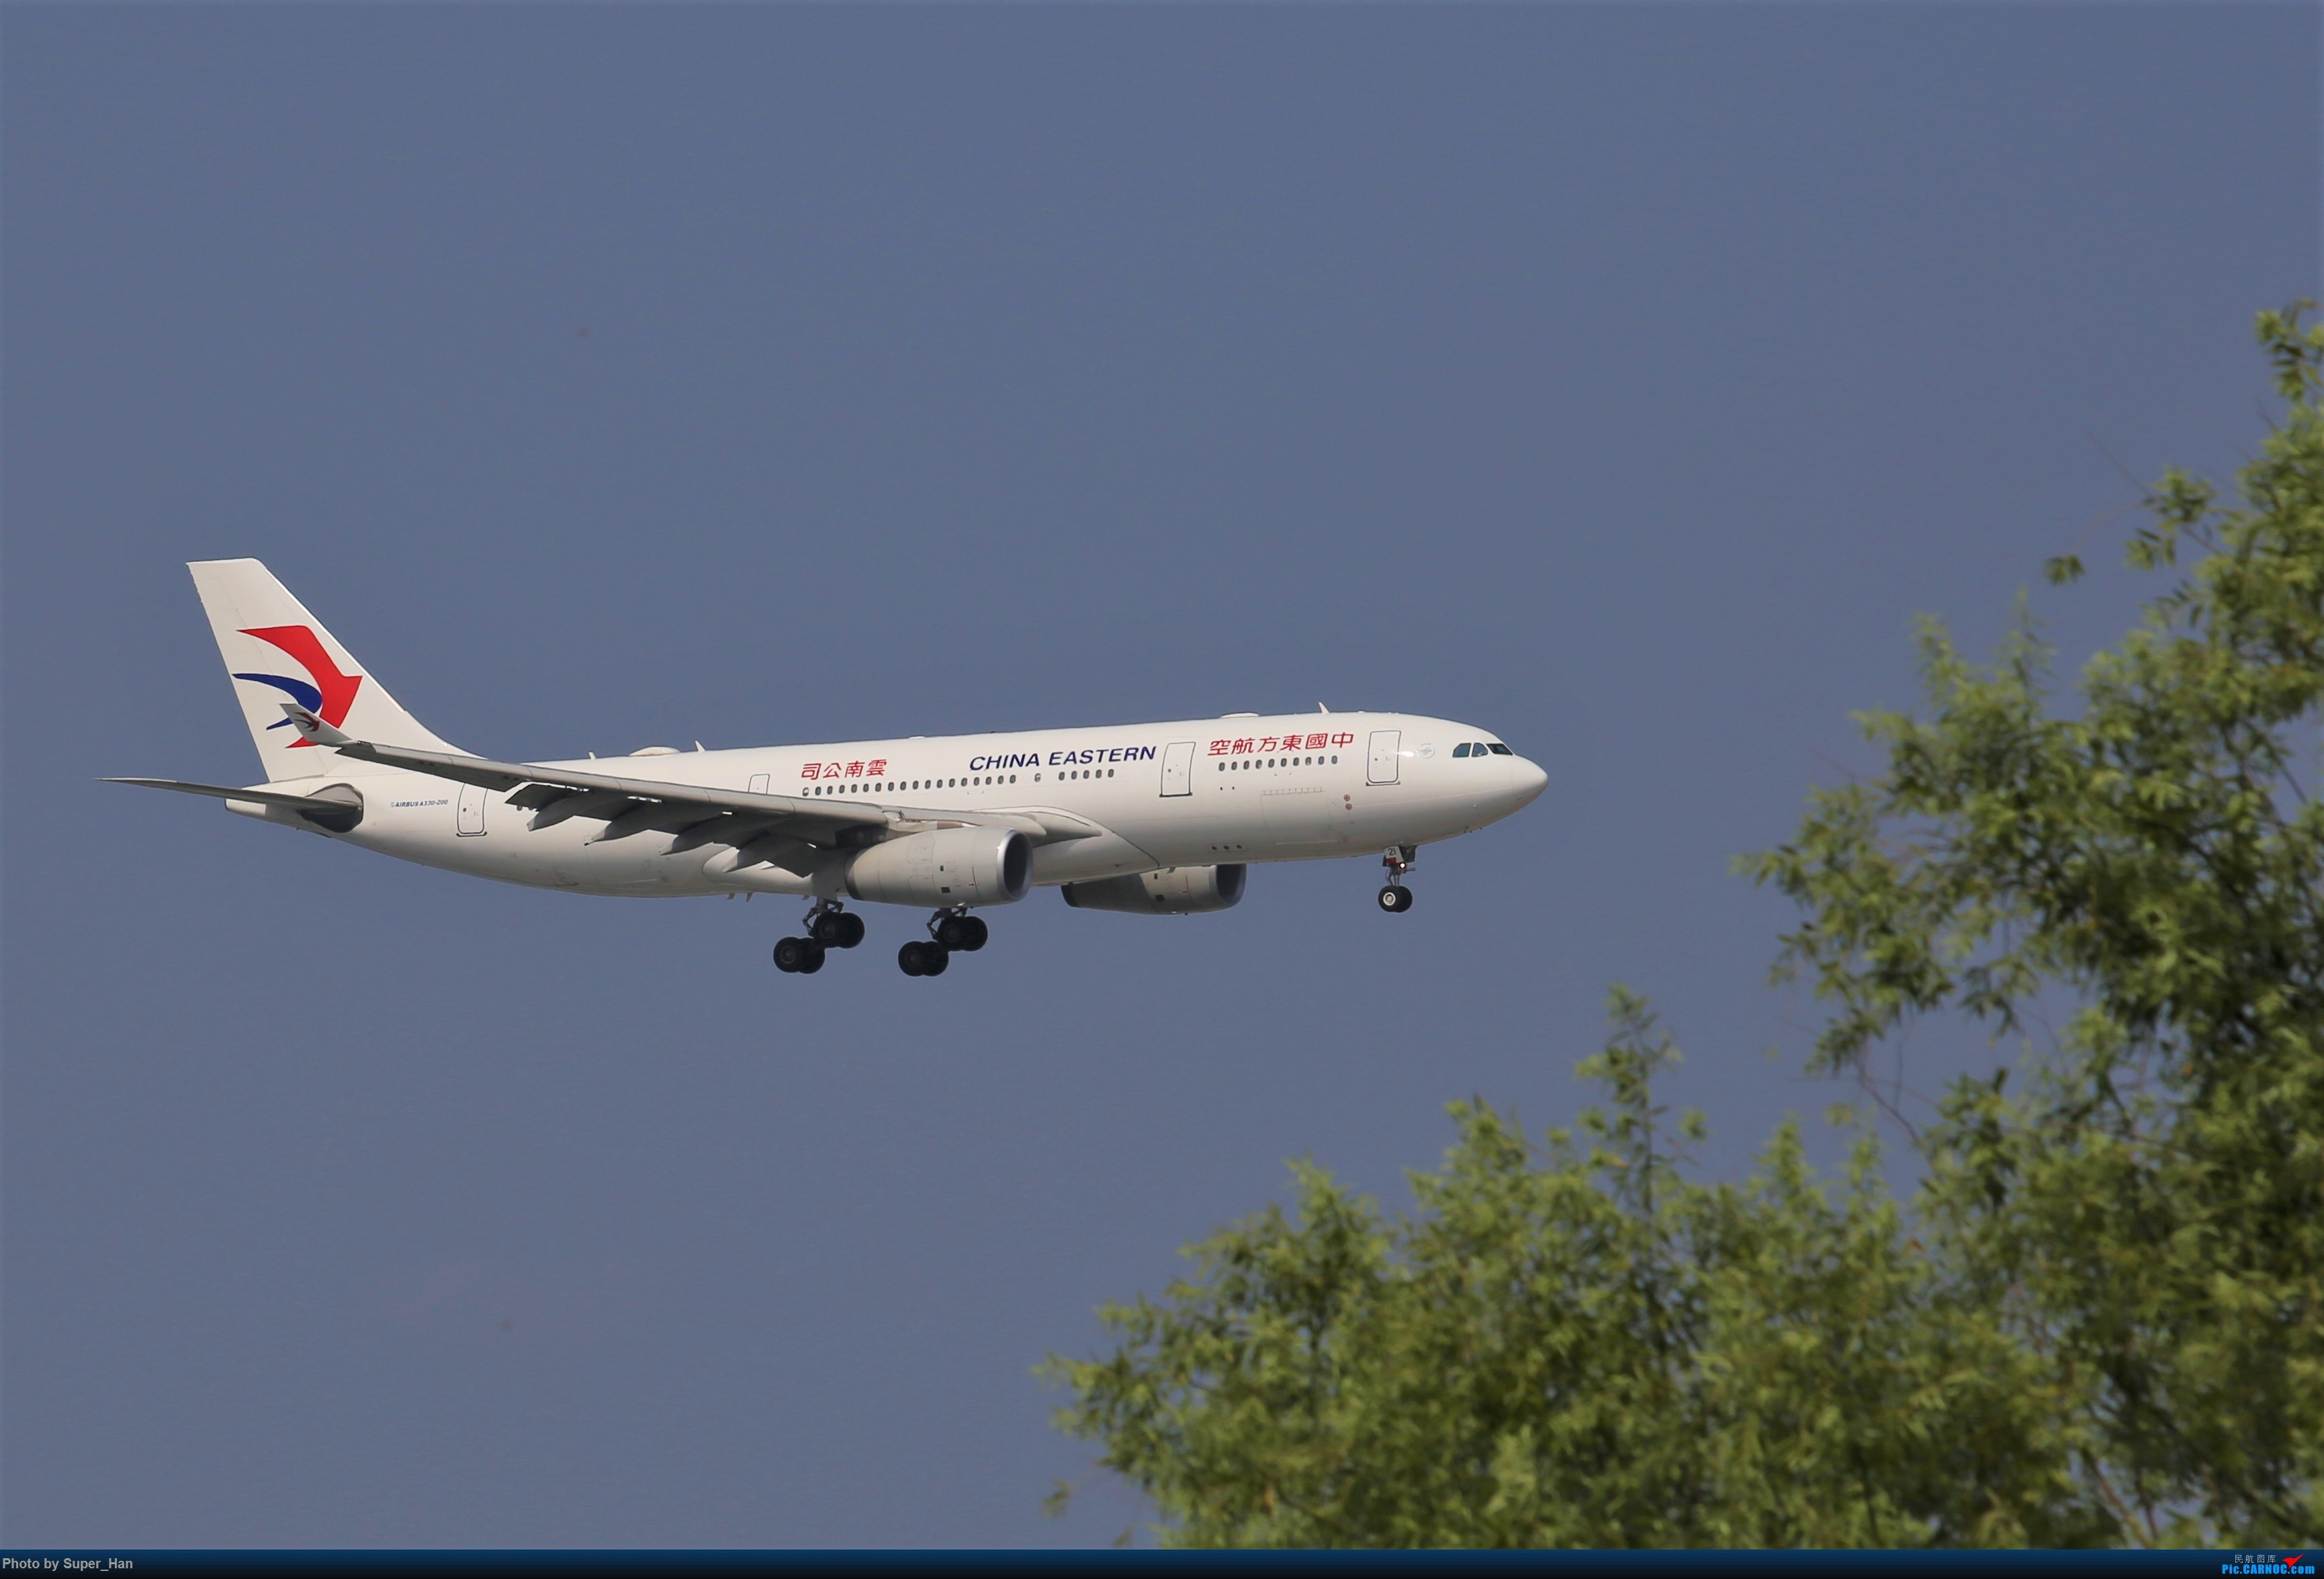 Re:[原创]0715去虹桥说走就走【最多的330篇】 AIRBUS A330-200 B-5921 中国上海虹桥国际机场